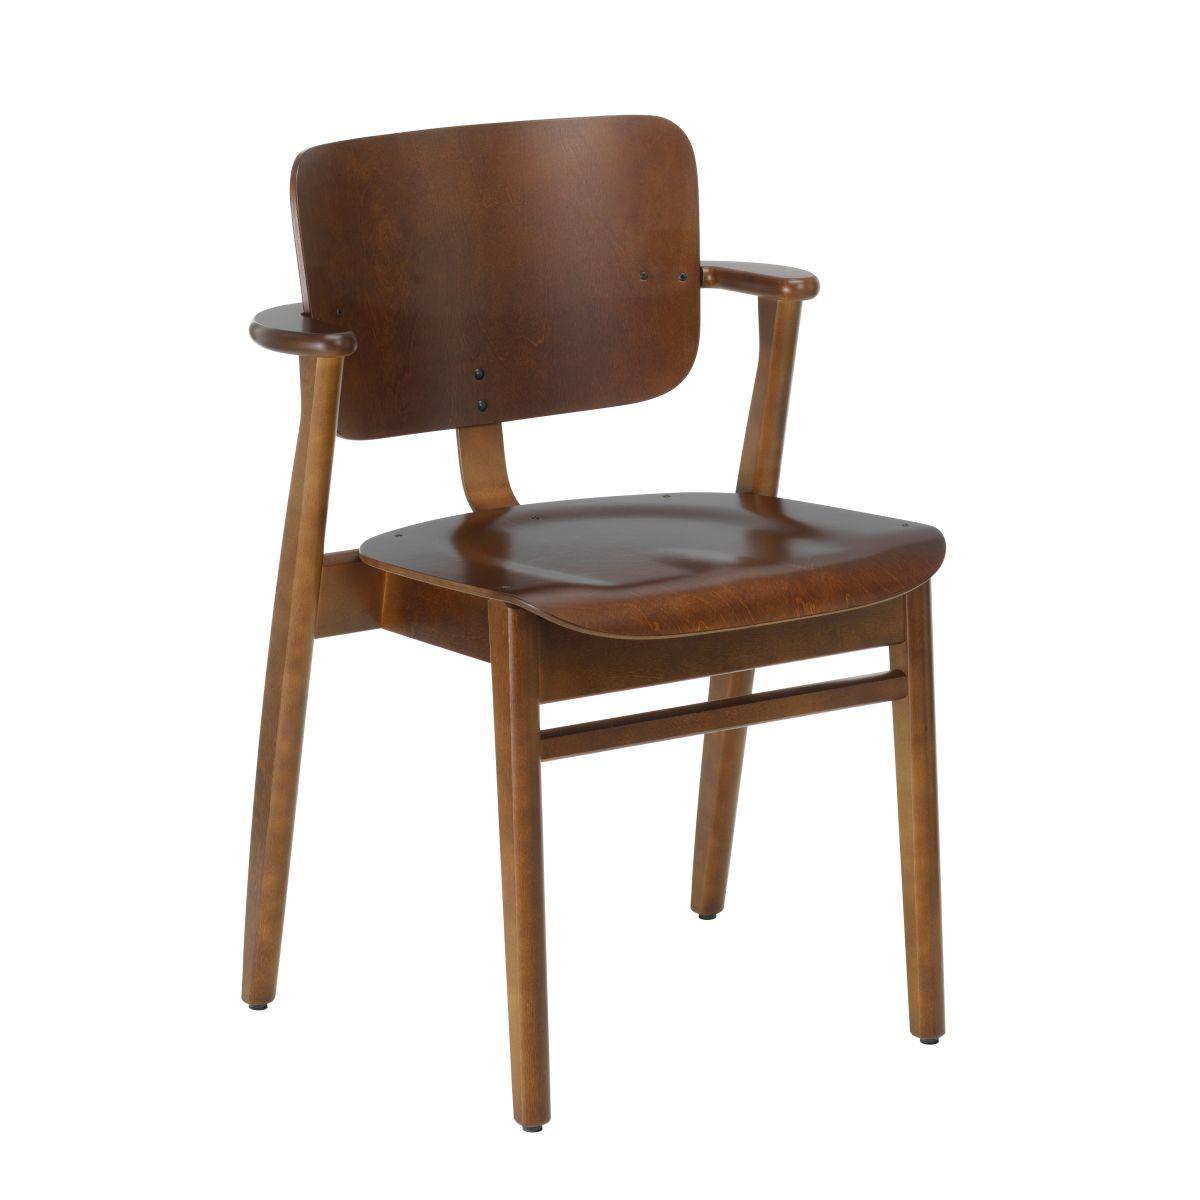 Domus_Chair_walnut_stain_F